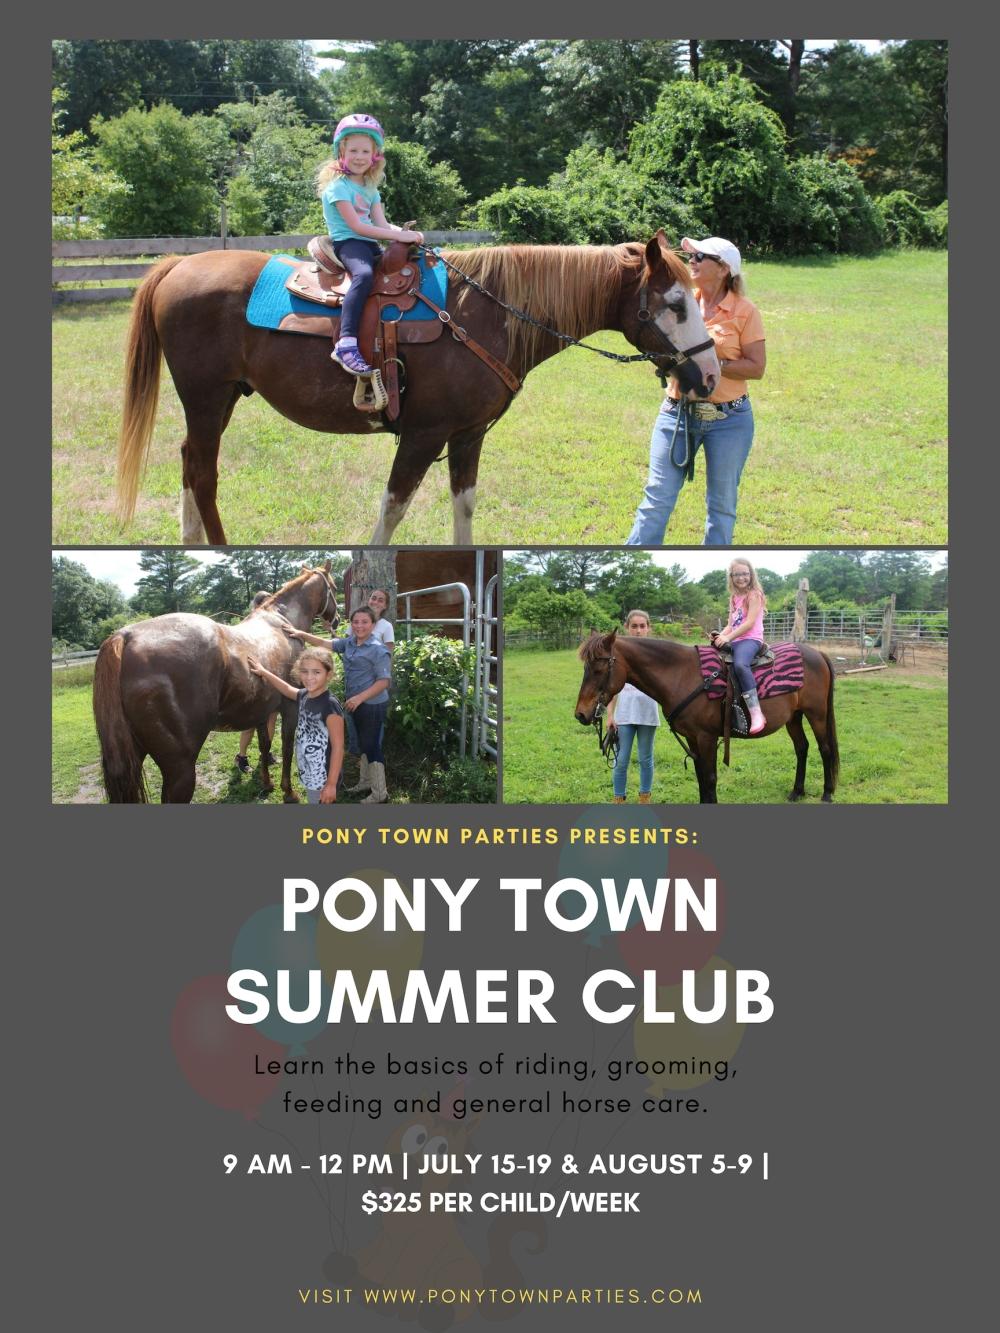 Pony town summer club.jpg